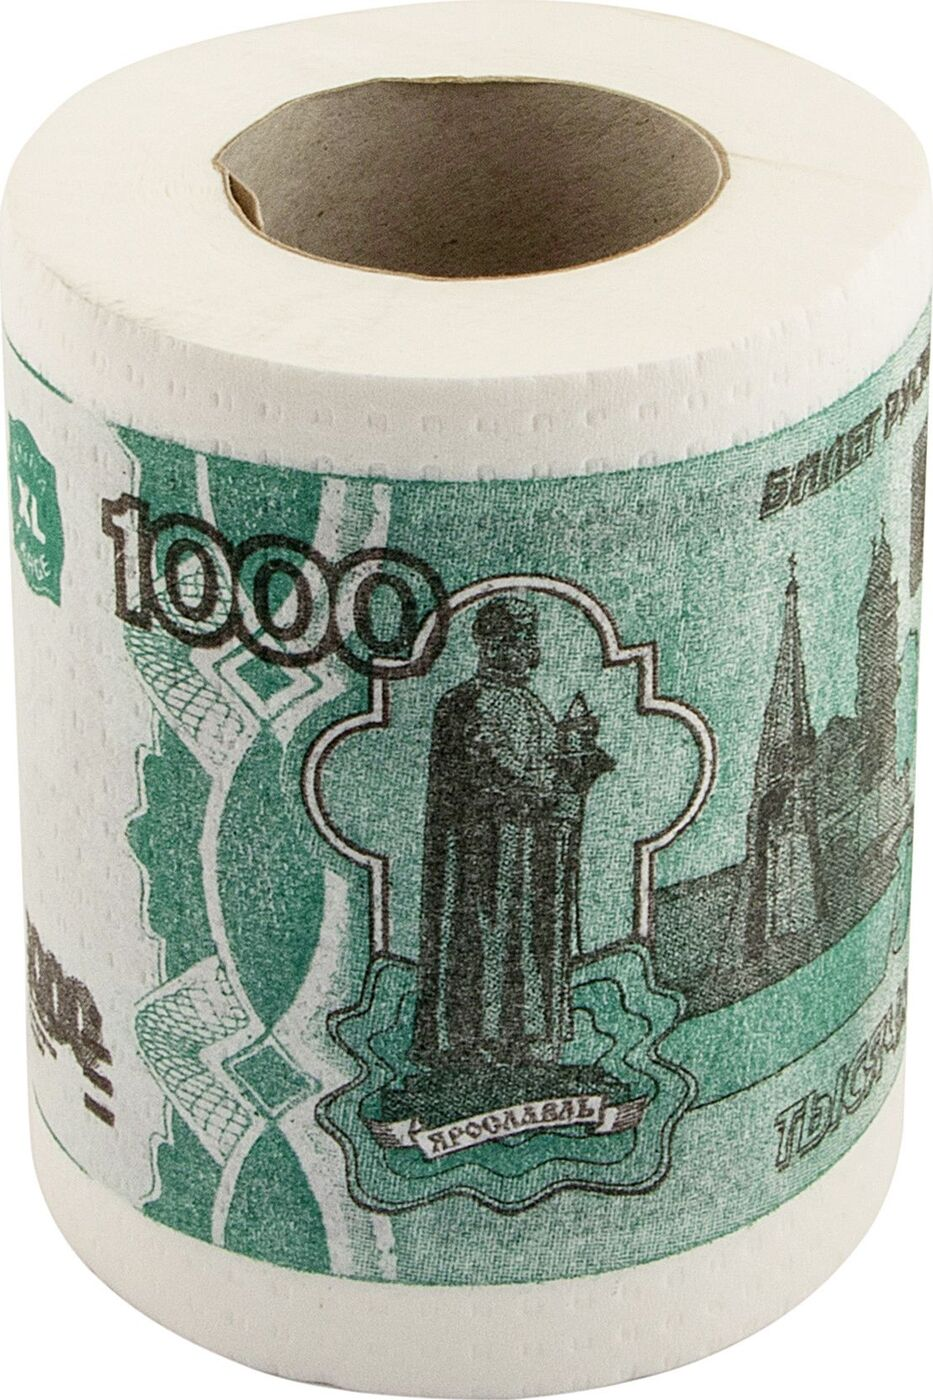 Бумага туалетная Эврика 1000 рублей телефон за 1000 рублей